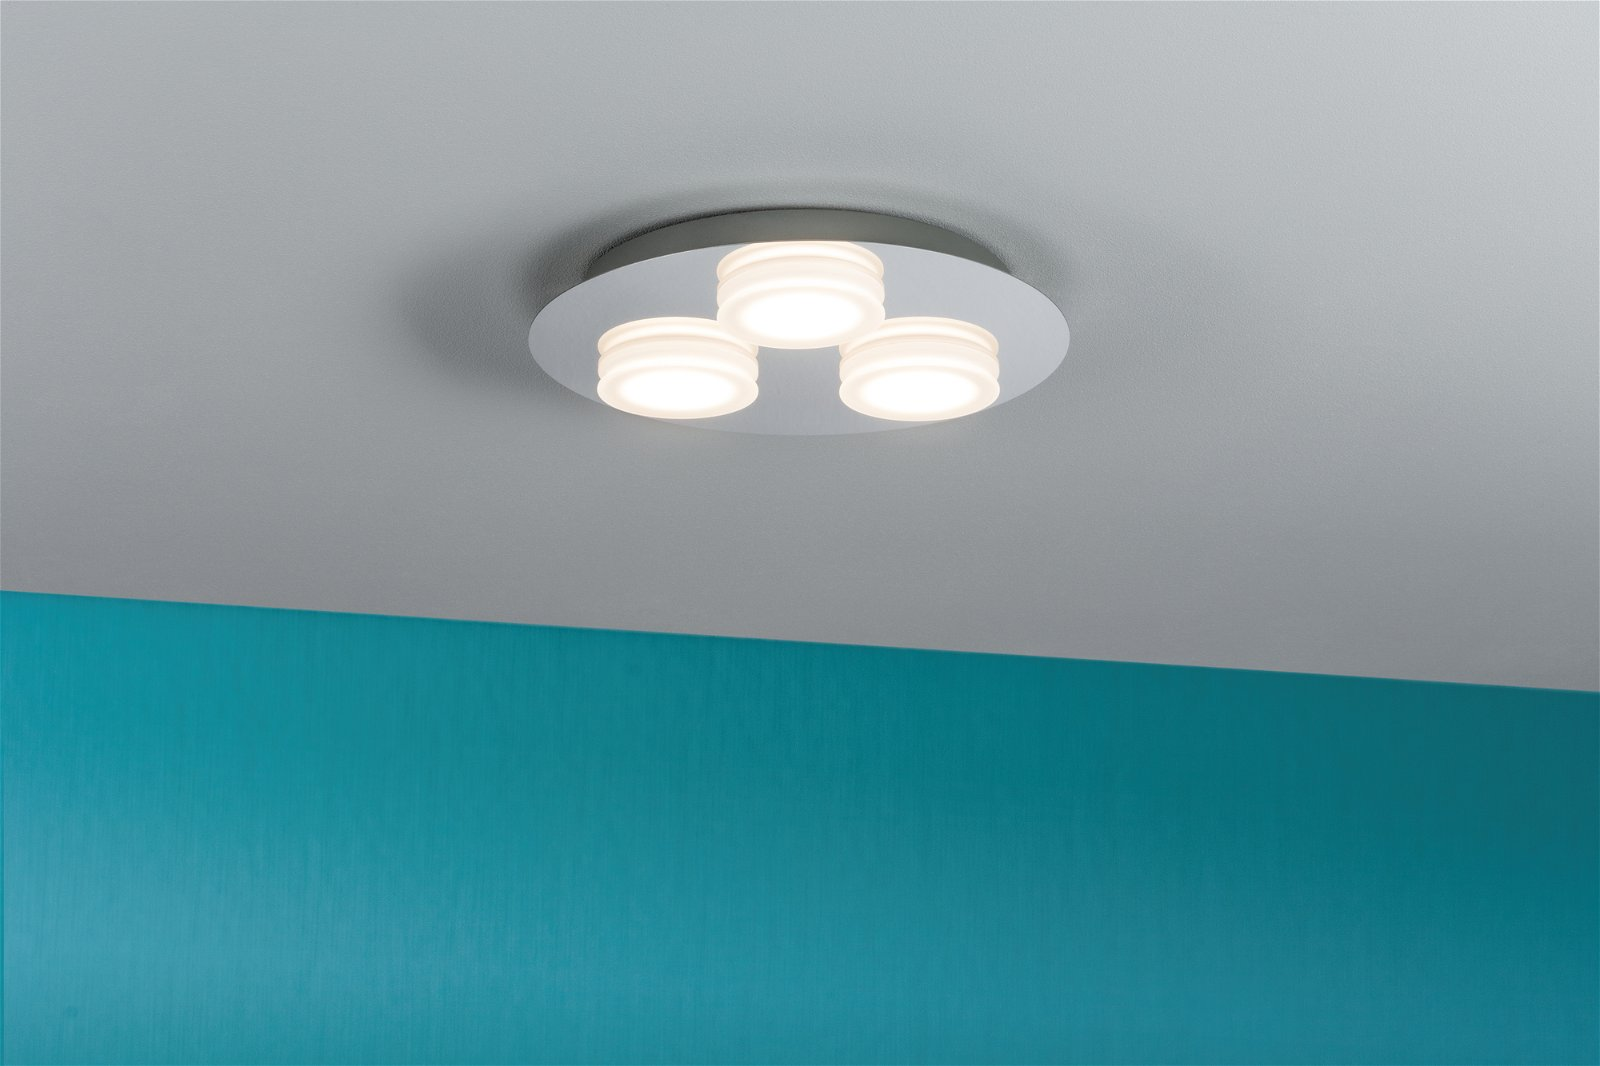 LED Deckenleuchte Doradus 3000K 3x420lm 230V 3x4,7W Chrom